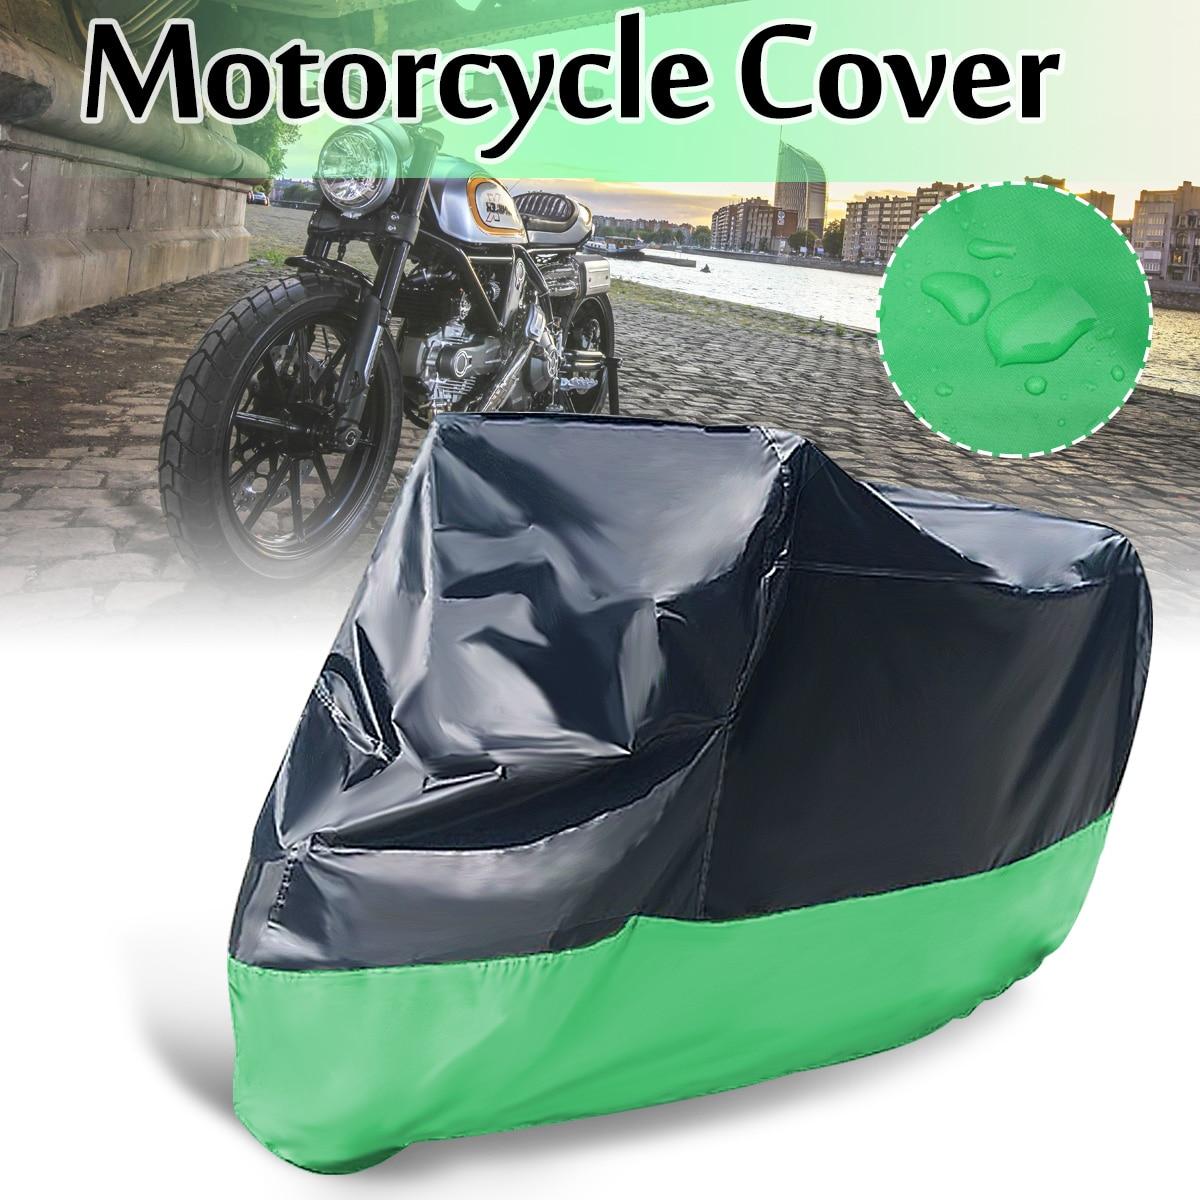 Mofaner Universal impermeable motocicleta cubierta hoja motocicleta moto ciclomotor funda cubierta M XL XXL